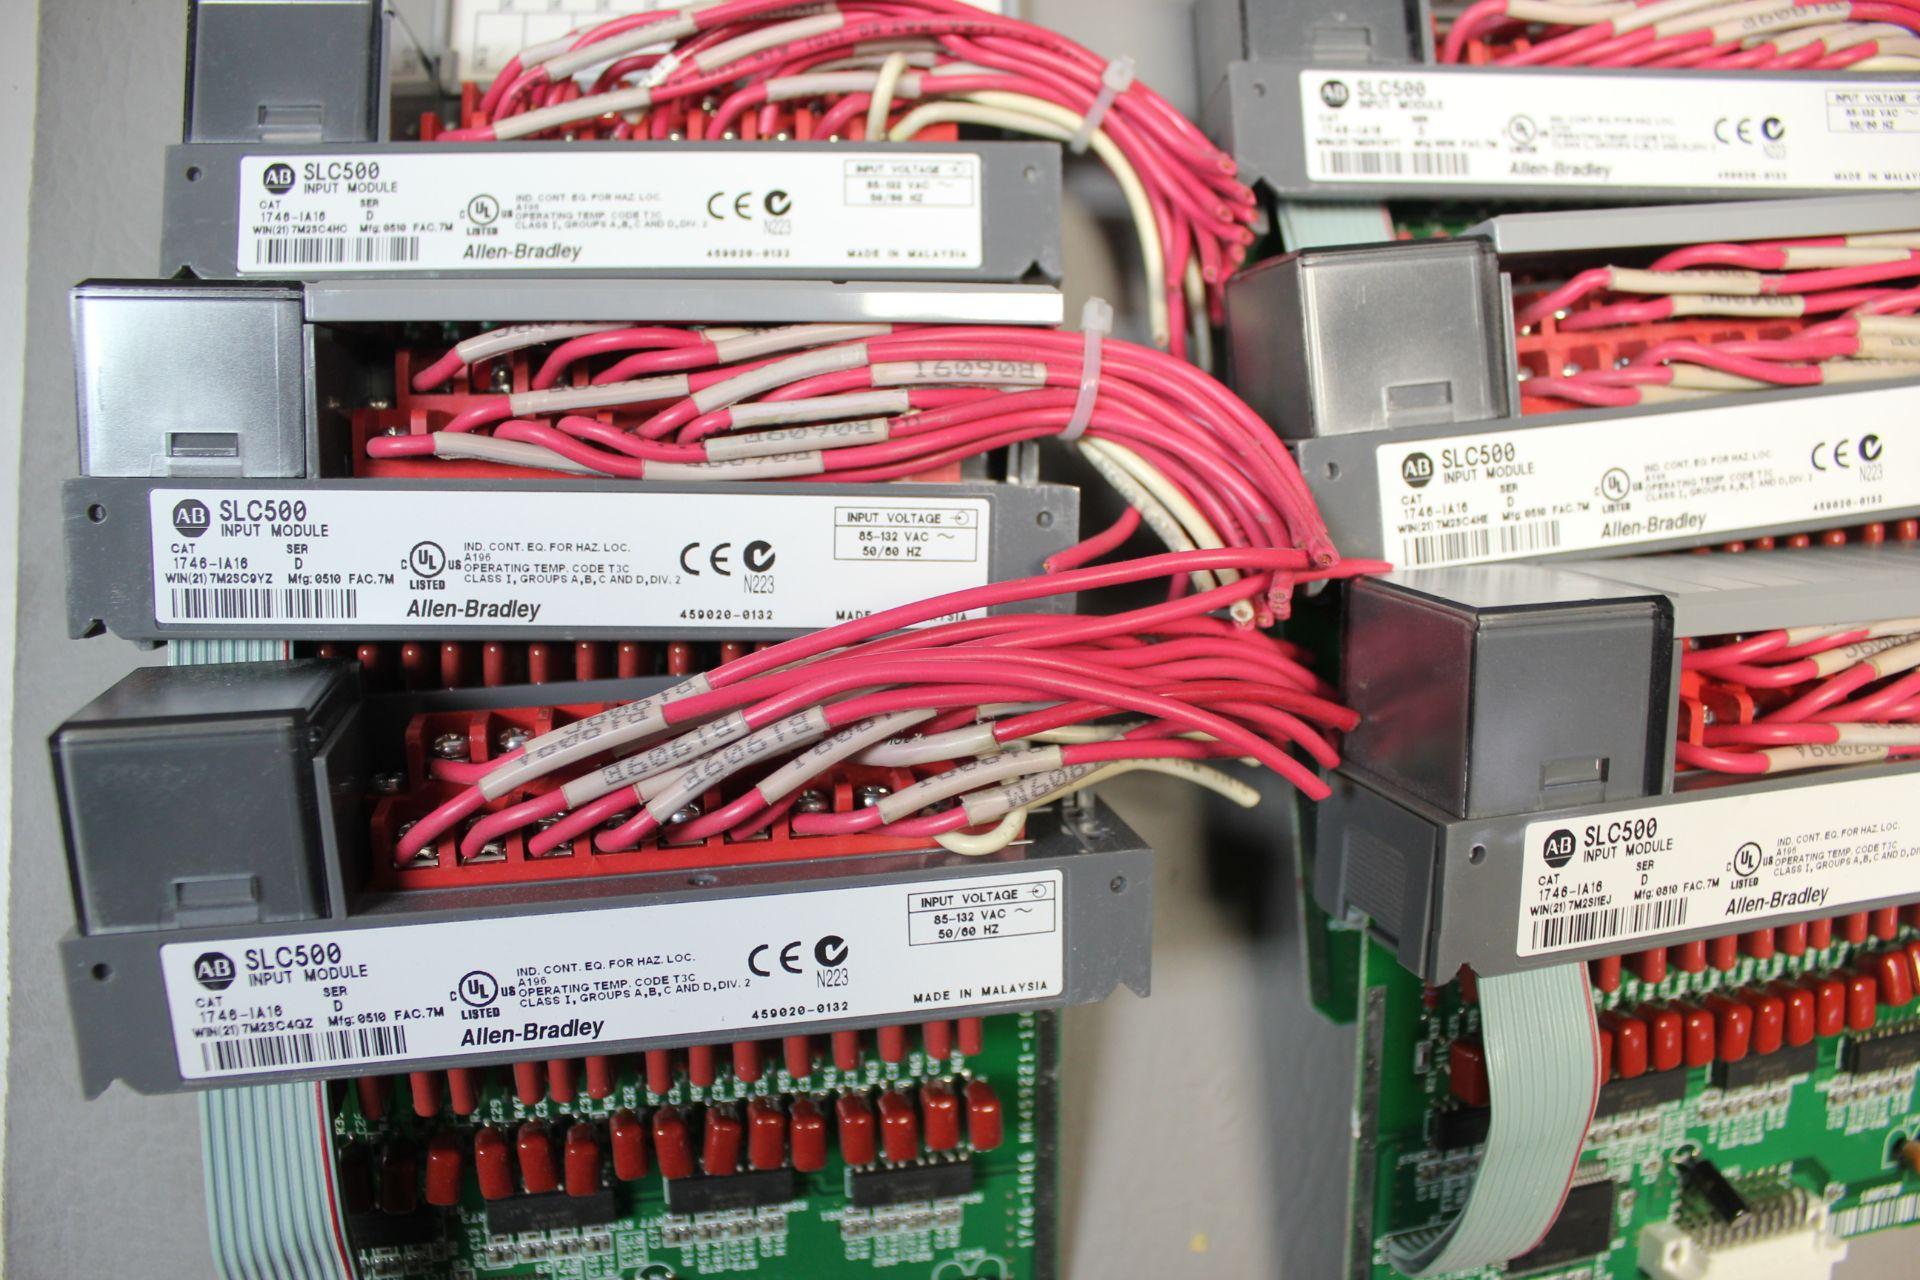 LOT OF ALLEN BRADLEY PLC MODULES - Image 5 of 5